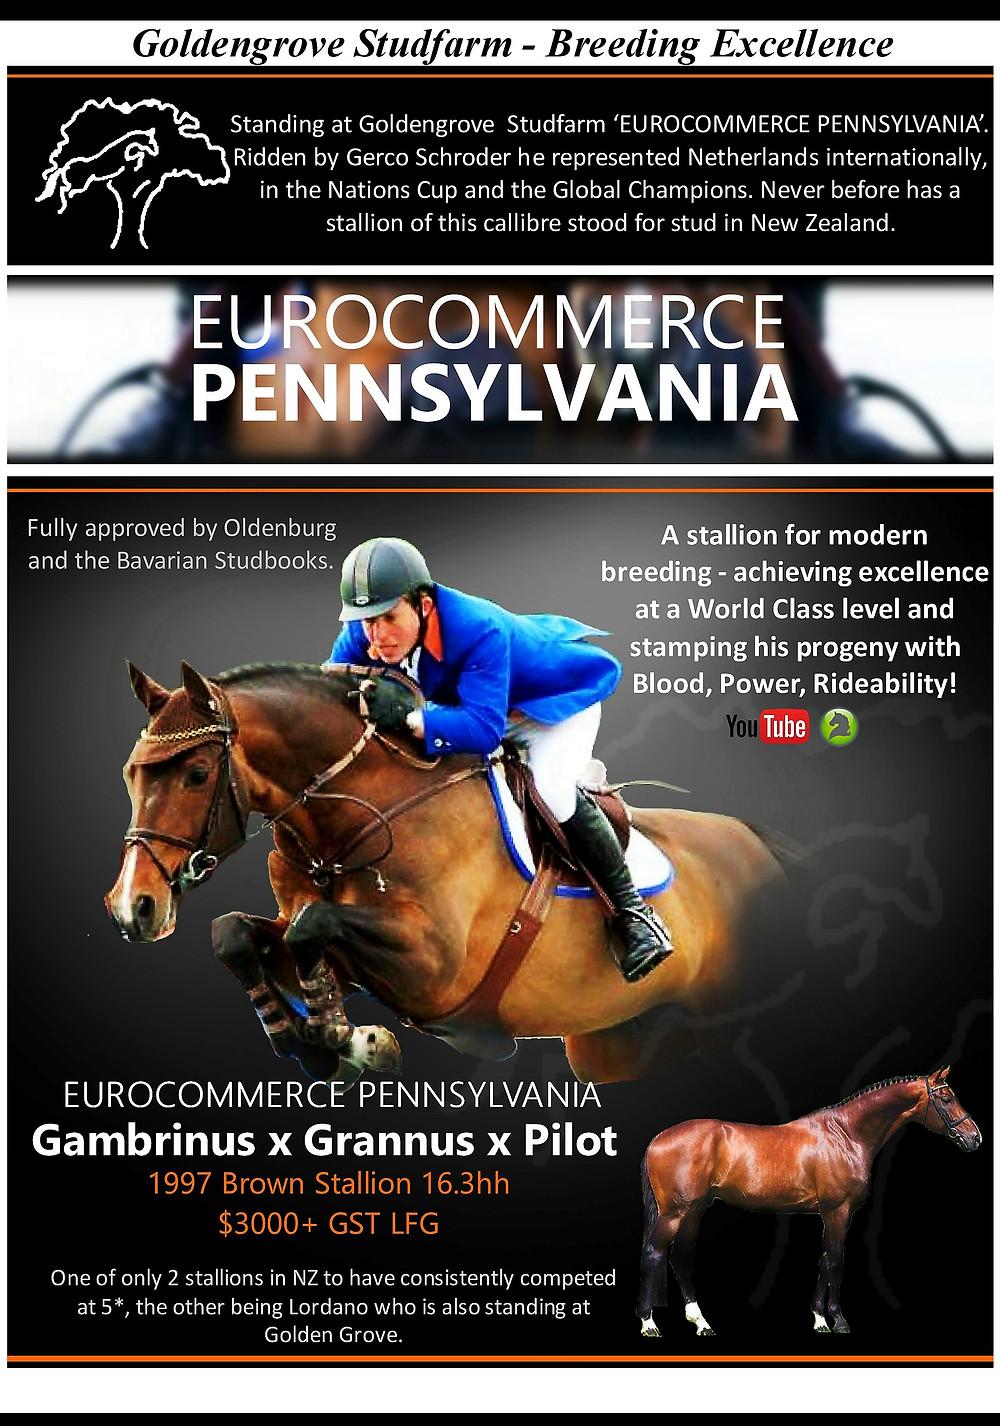 Eurocommerce Pennsylvania